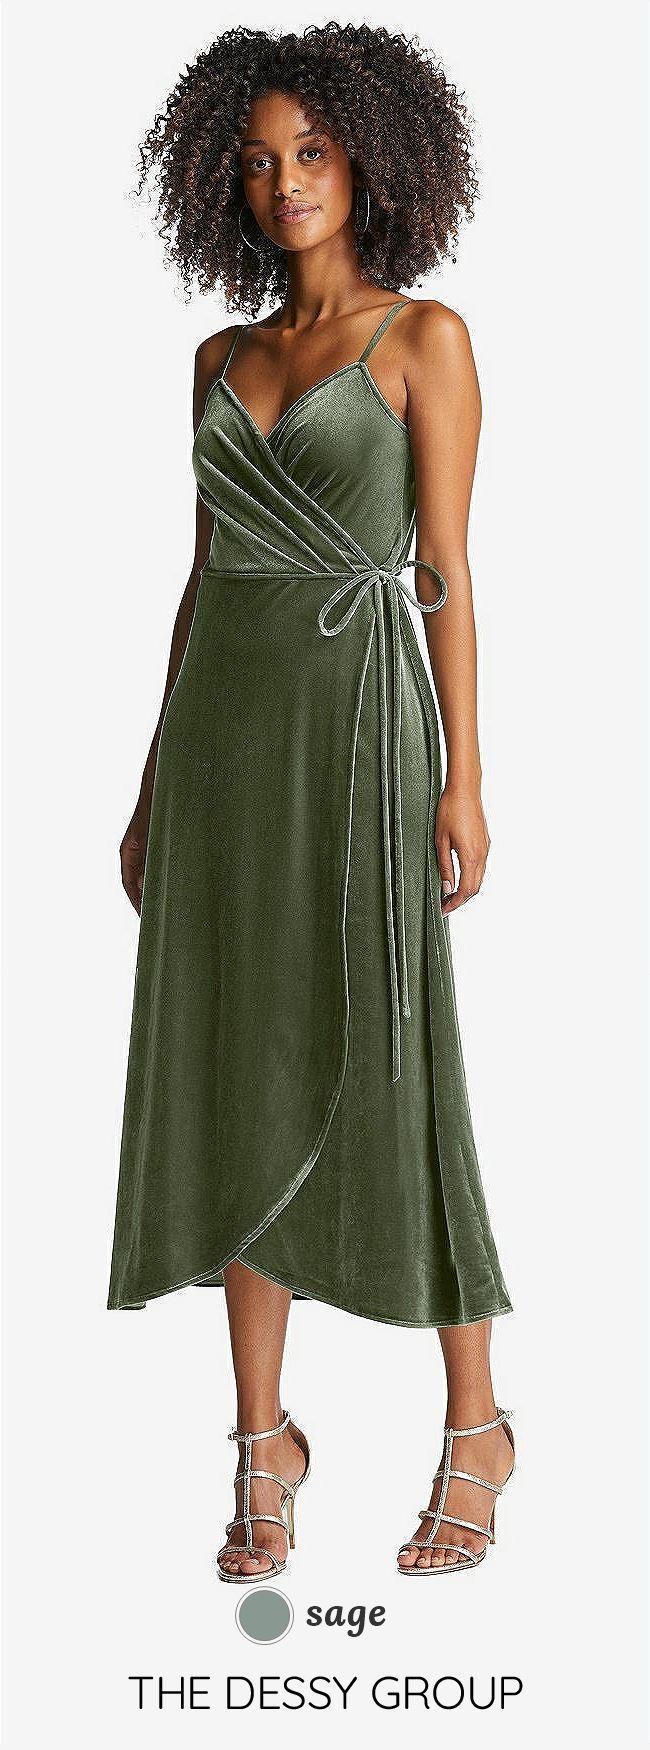 Velvet Dusty Sage Green Bridesmaid Dresses Sage Green Bridesmaid Dress Velvet Bridesmaid Dresses Green Bridesmaid Dresses [ 1750 x 650 Pixel ]